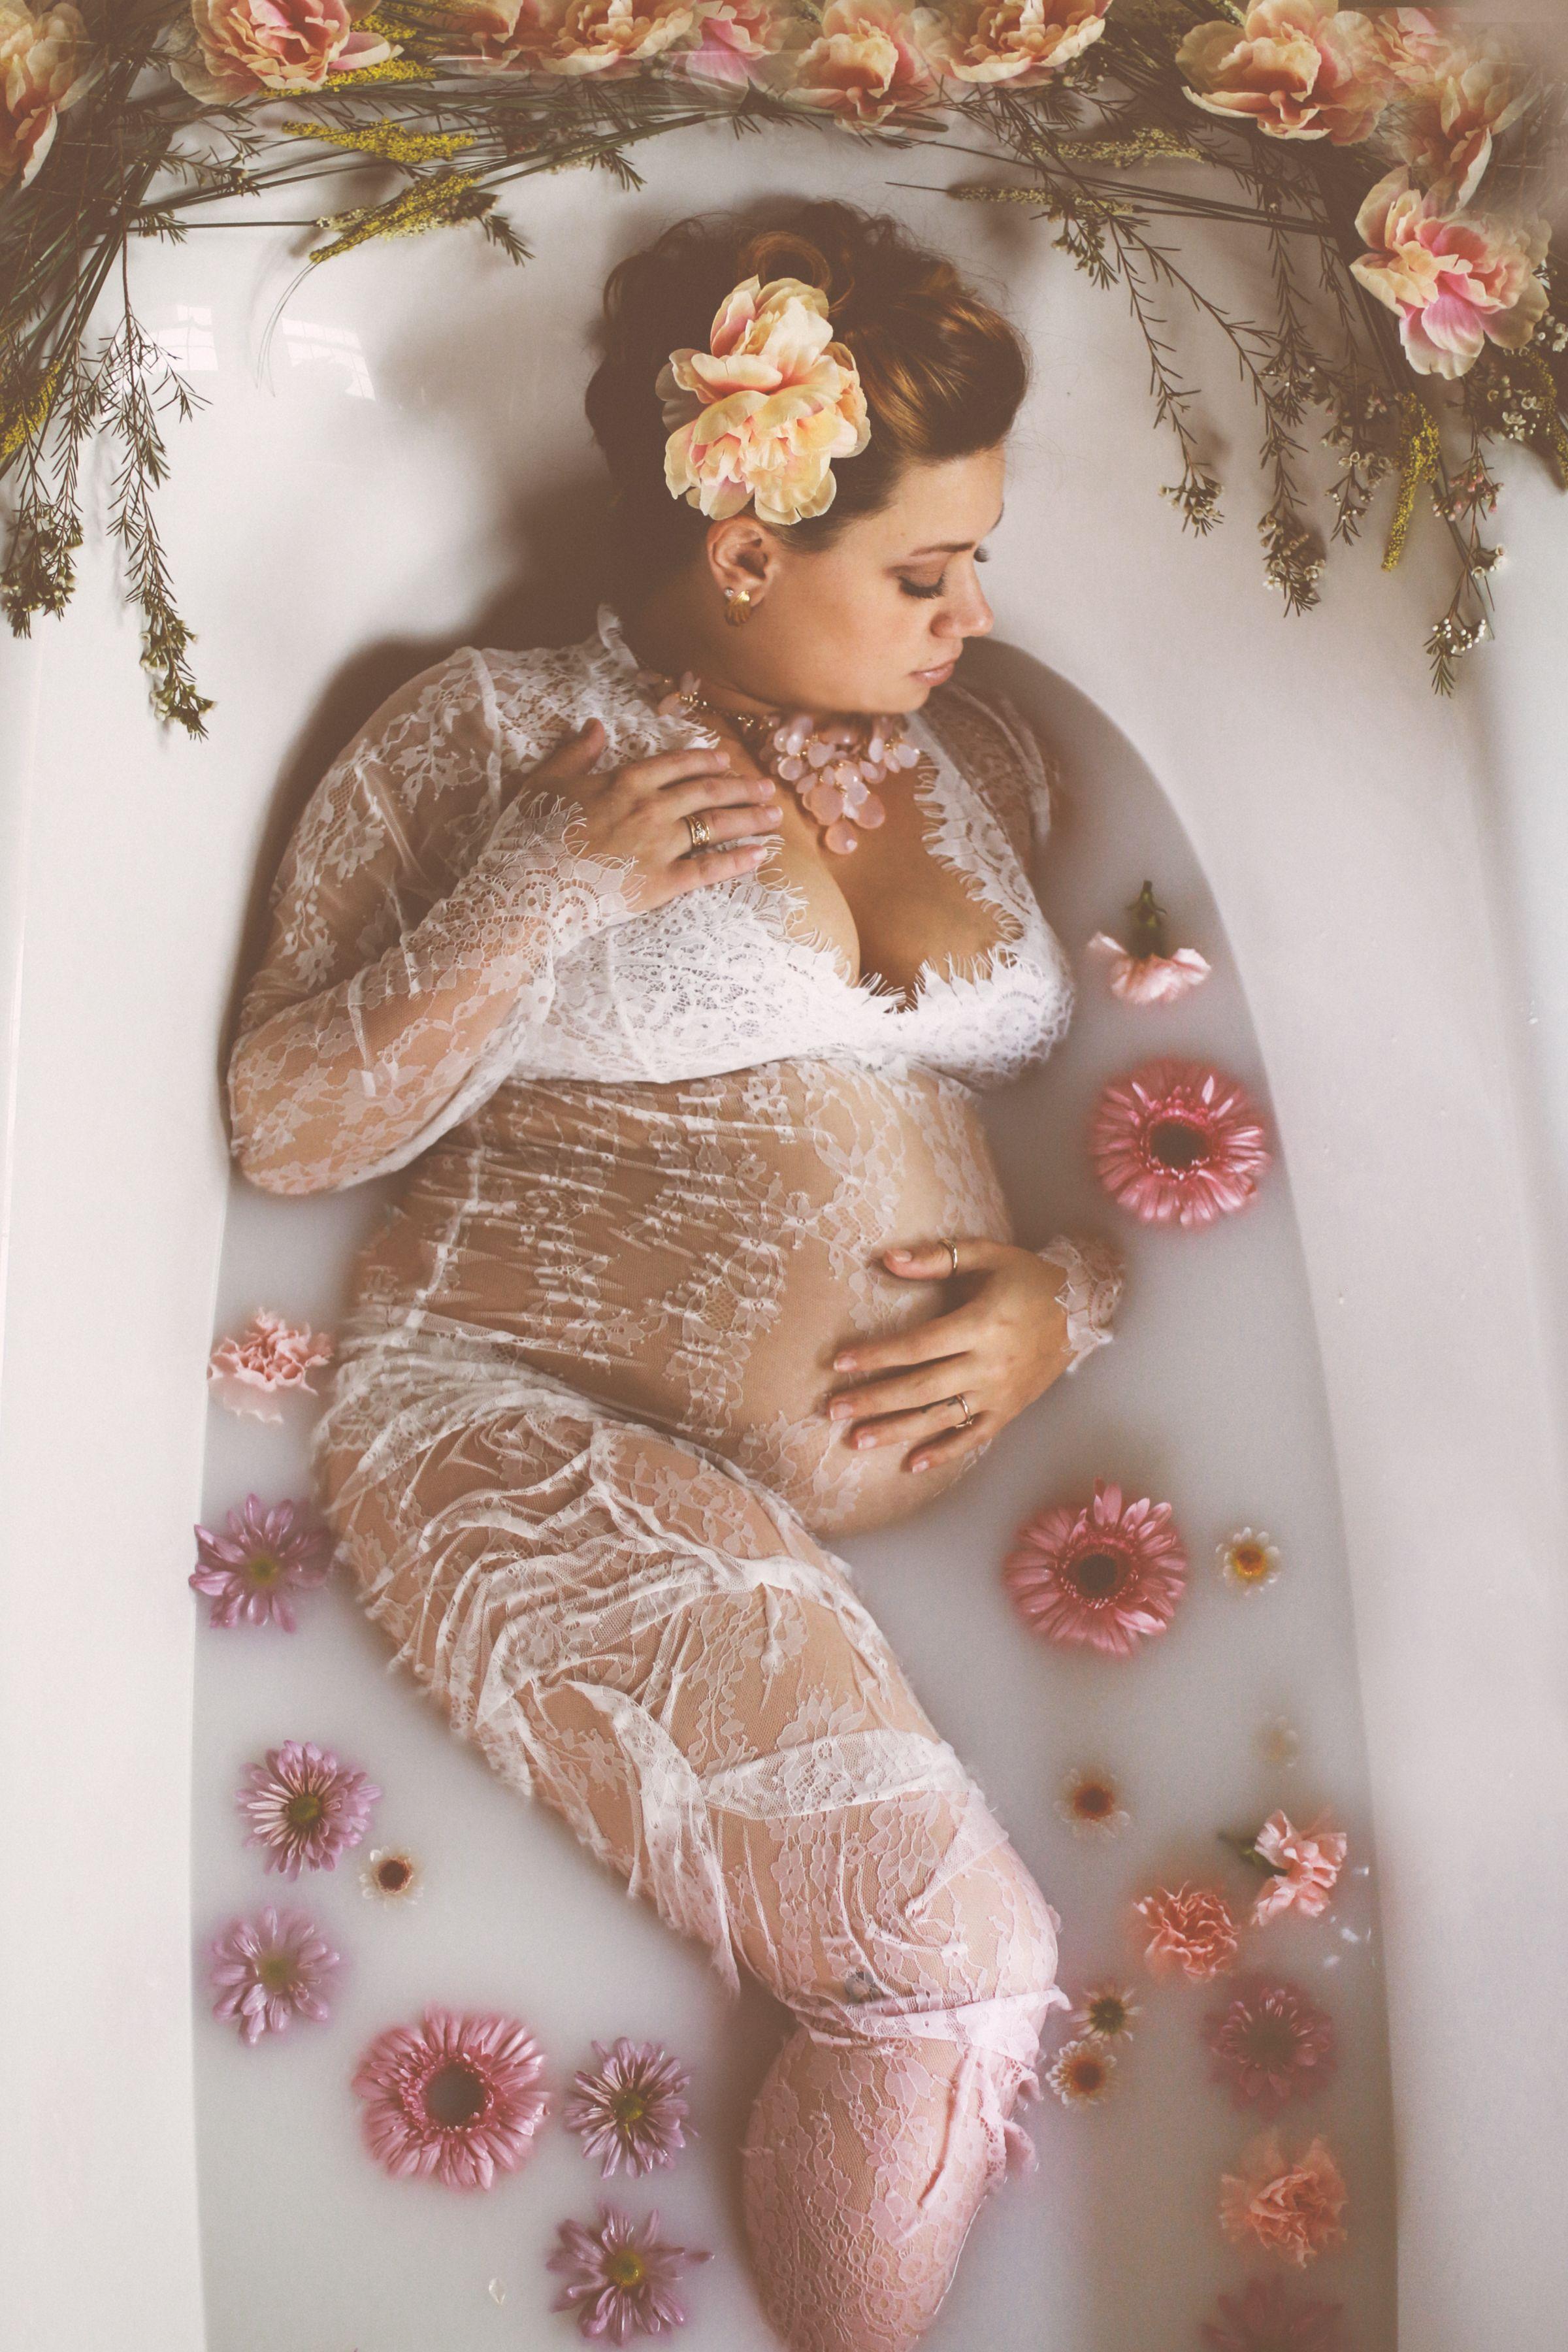 AMA Colorado Maternity Photography   Pregnancy Photography   Expecting Photography